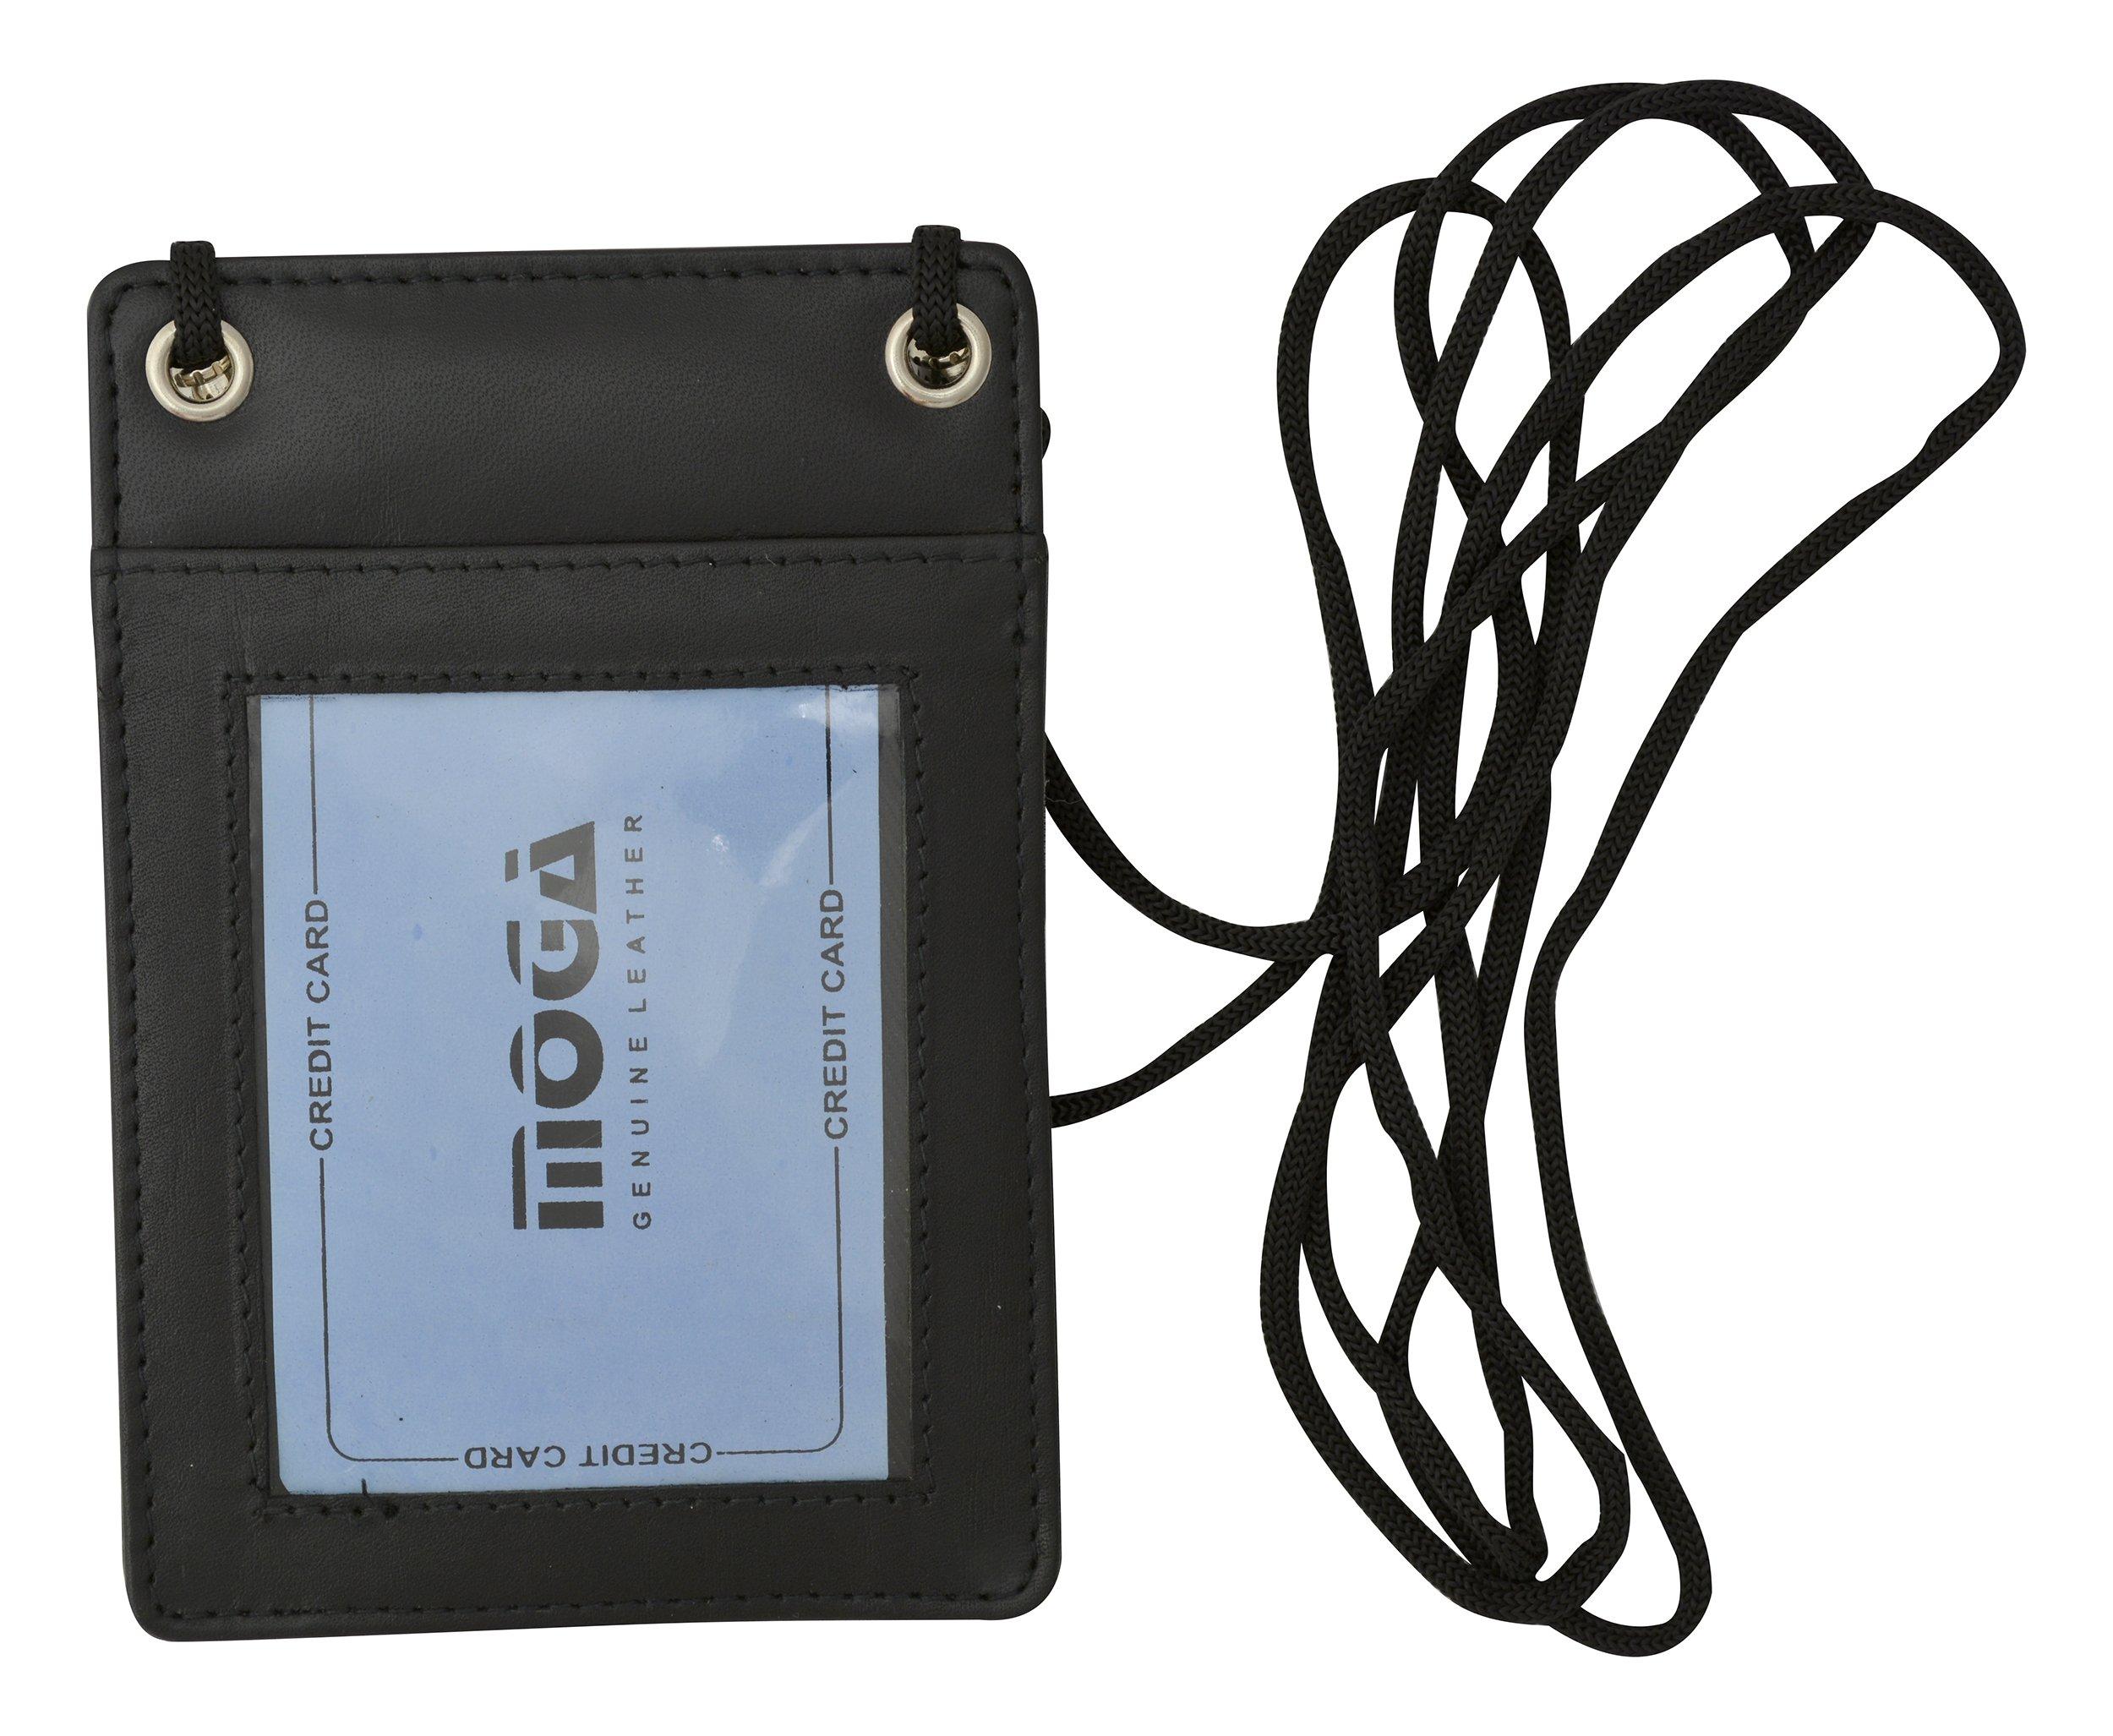 Moga Genuine High End Leather Neck Strap ID Badge Credit Card Holder Pouch Wallet (Black)